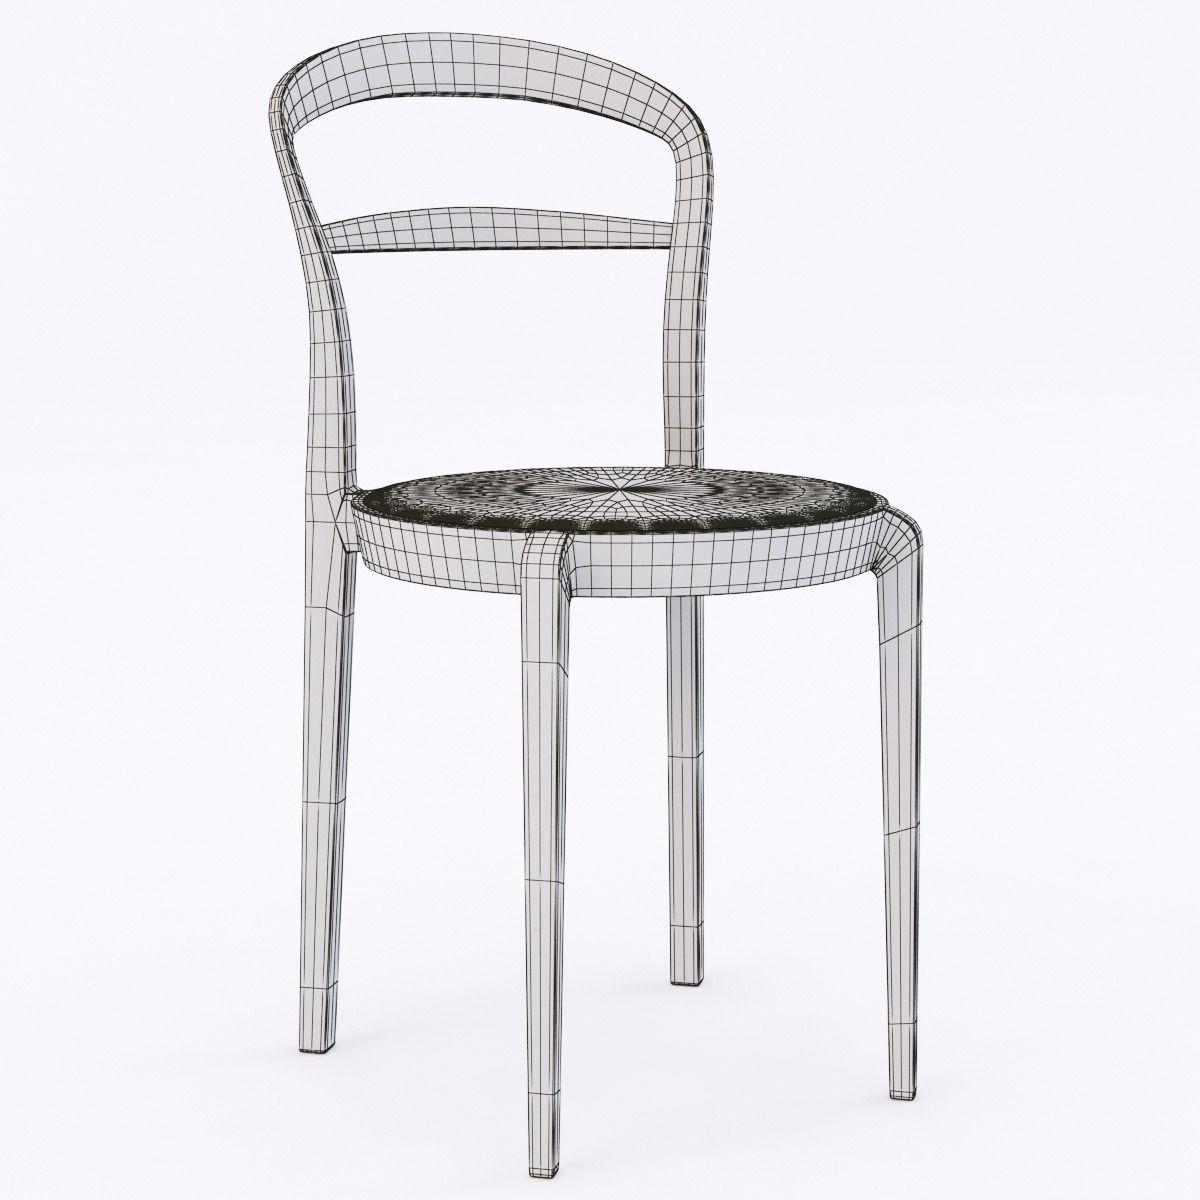 Calligaris cloe chair 3d model max obj 3ds fbx for Calligaris rende